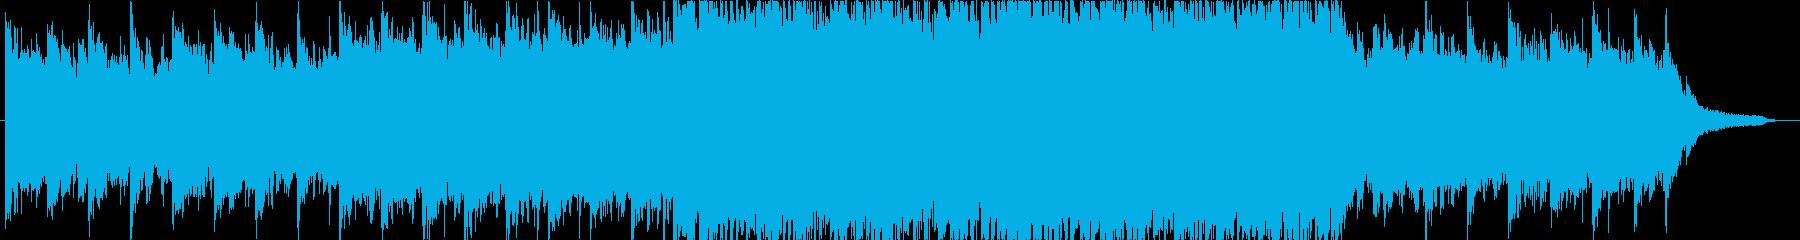 【BGM】和風なFuturepopの再生済みの波形